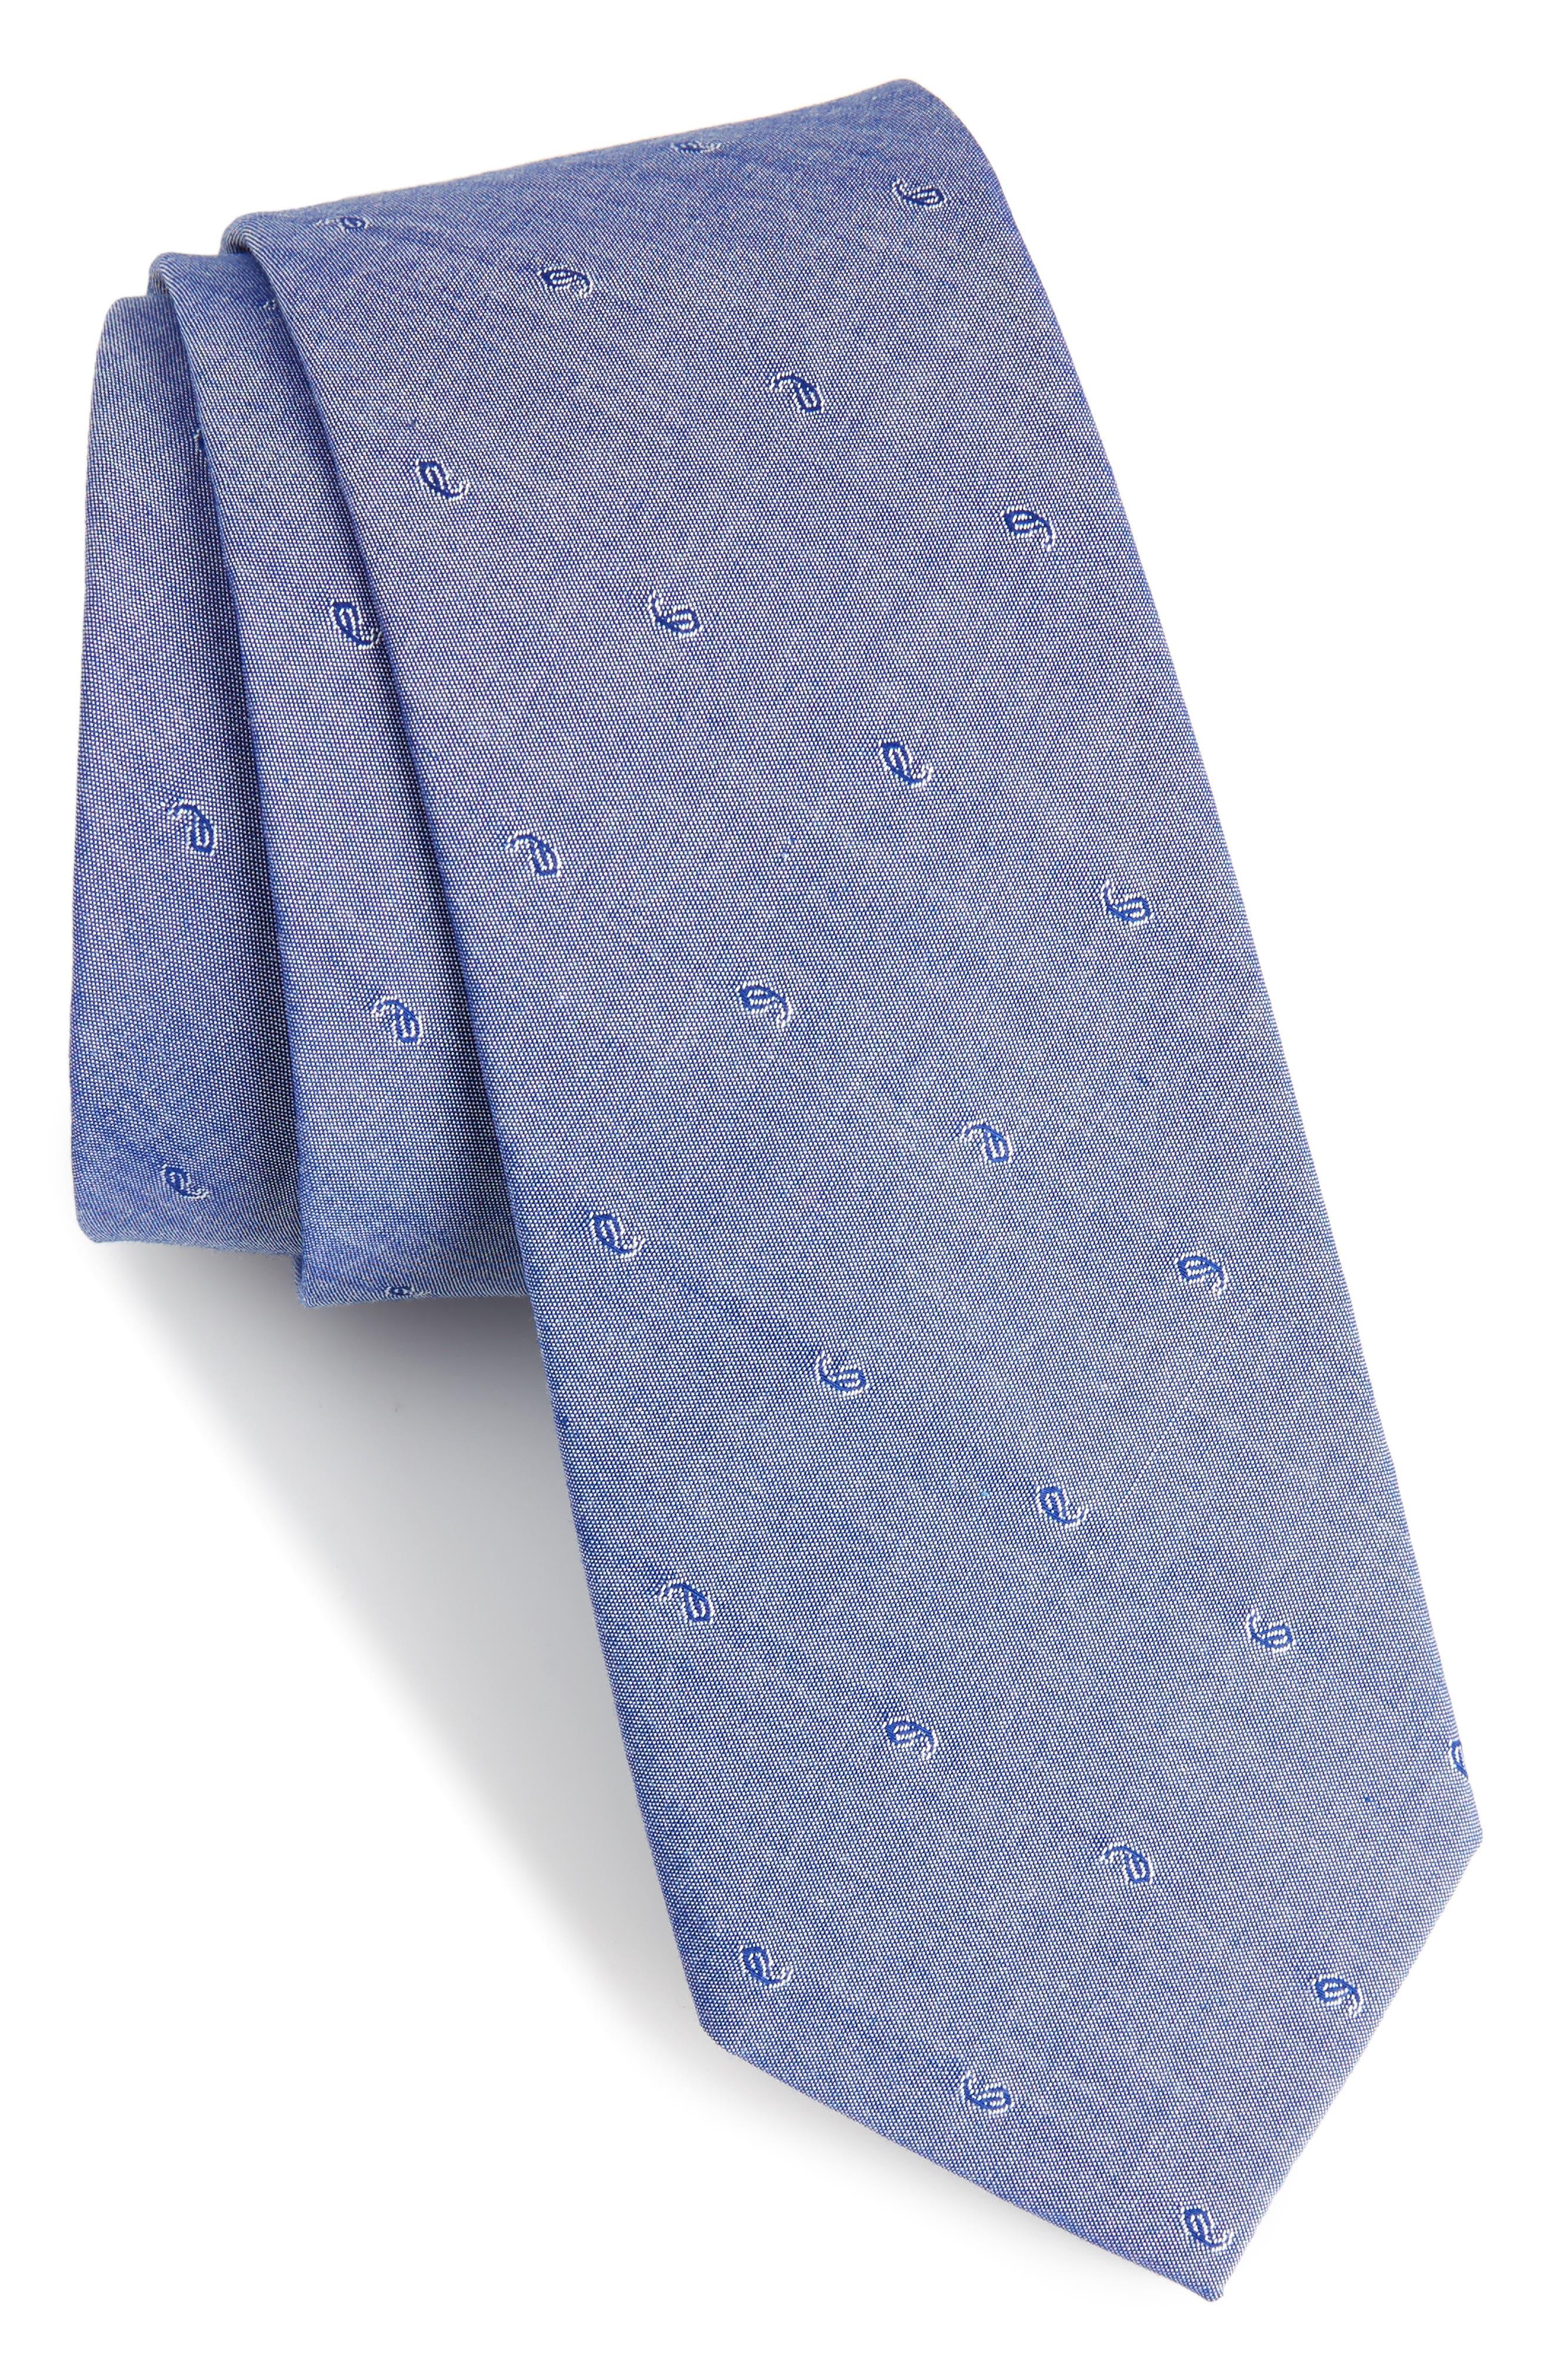 Indigo Pine Cotton Skinny Tie,                             Main thumbnail 1, color,